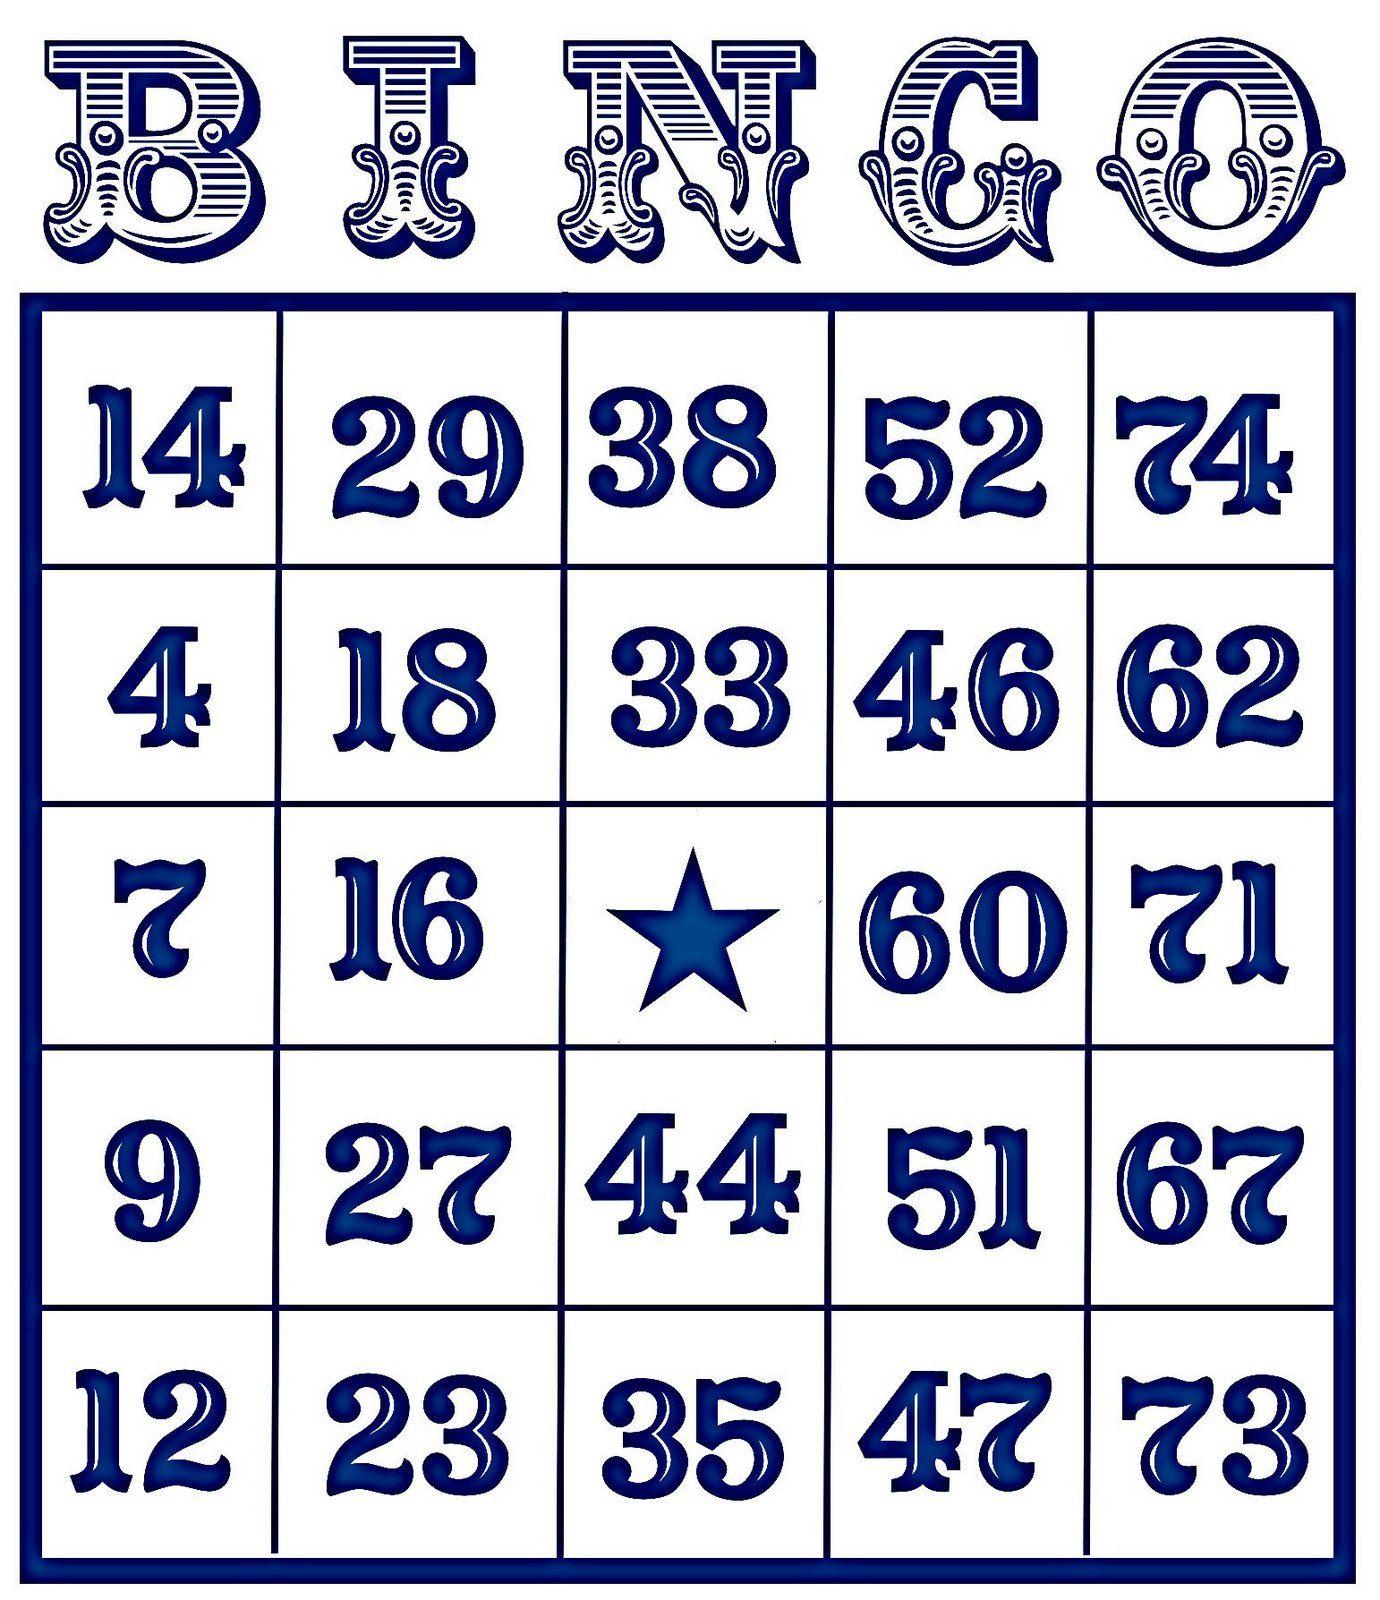 Bingo Card Vintage   Soldered Pendant Ideas   Free Bingo Cards, Free - Free Printable Bingo Cards With Numbers